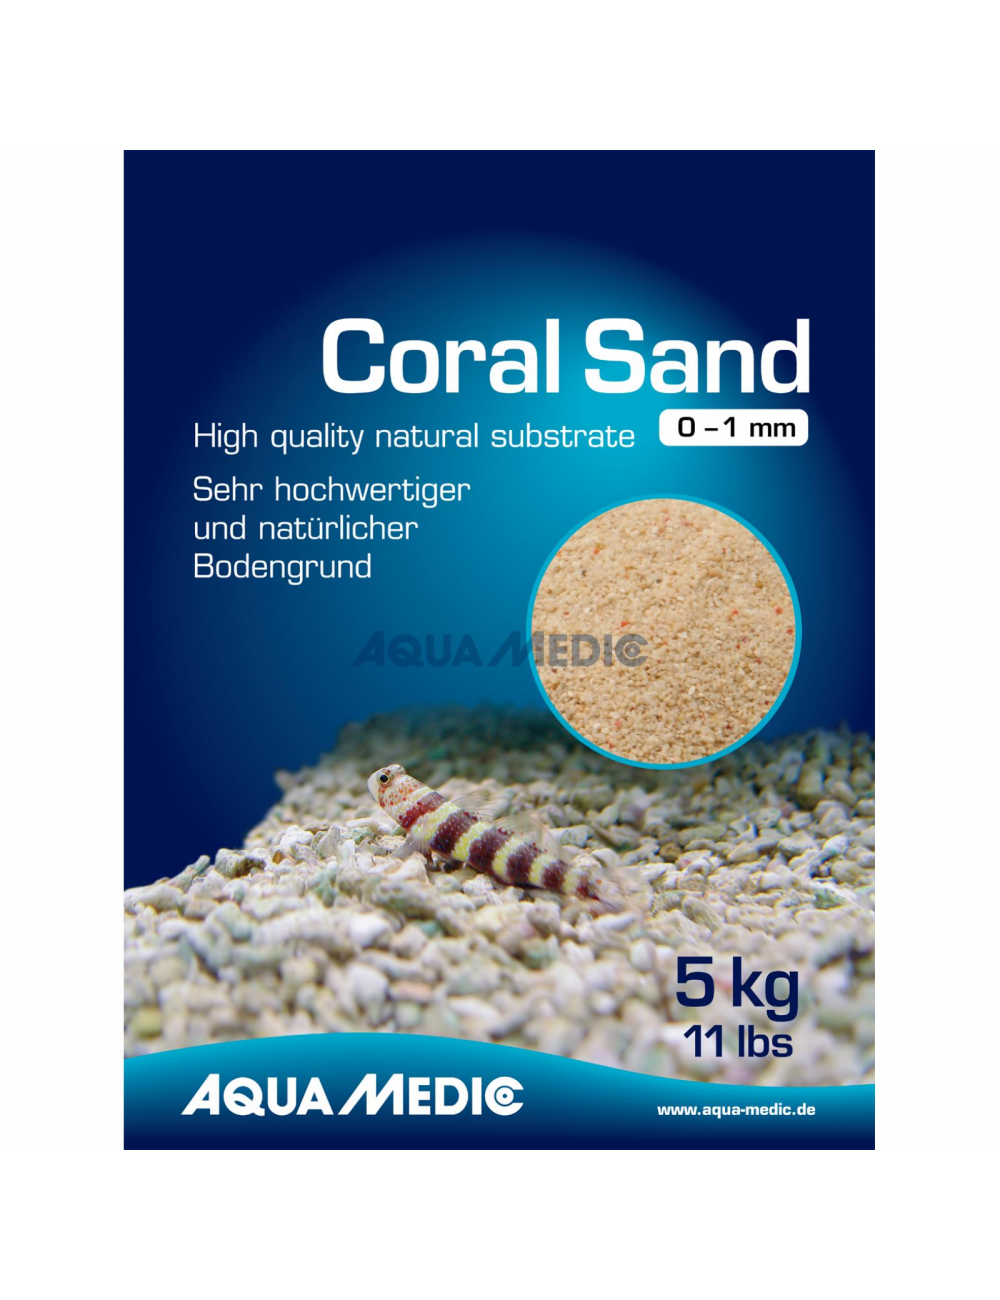 AQUA-MEDIC - Coral Sand - 2 - 5 mm - 10 kg sac